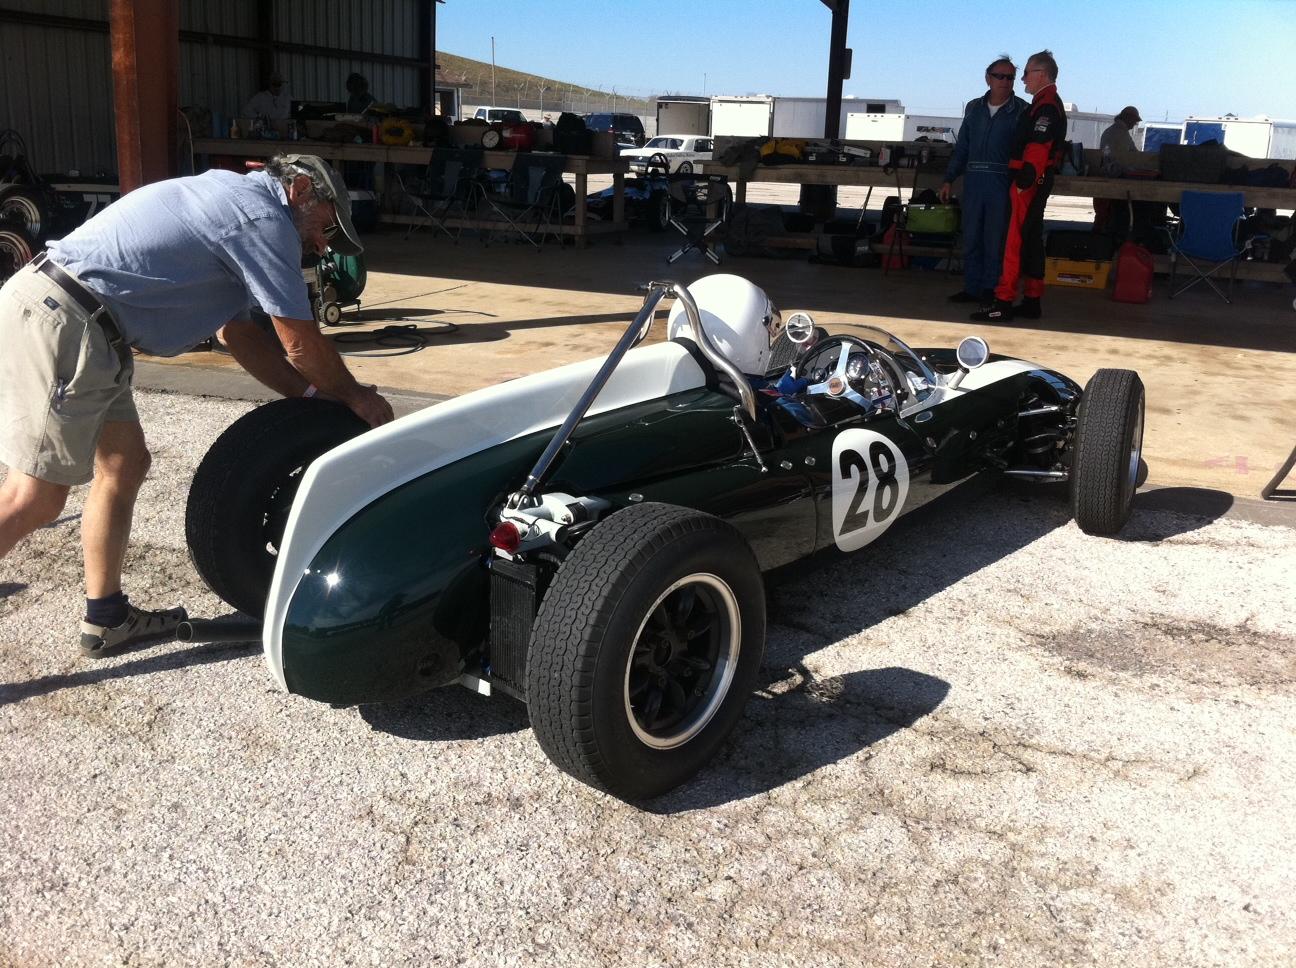 c 1960 Cooper T56? Formula Junior Race Car at Last Weekends Races ...